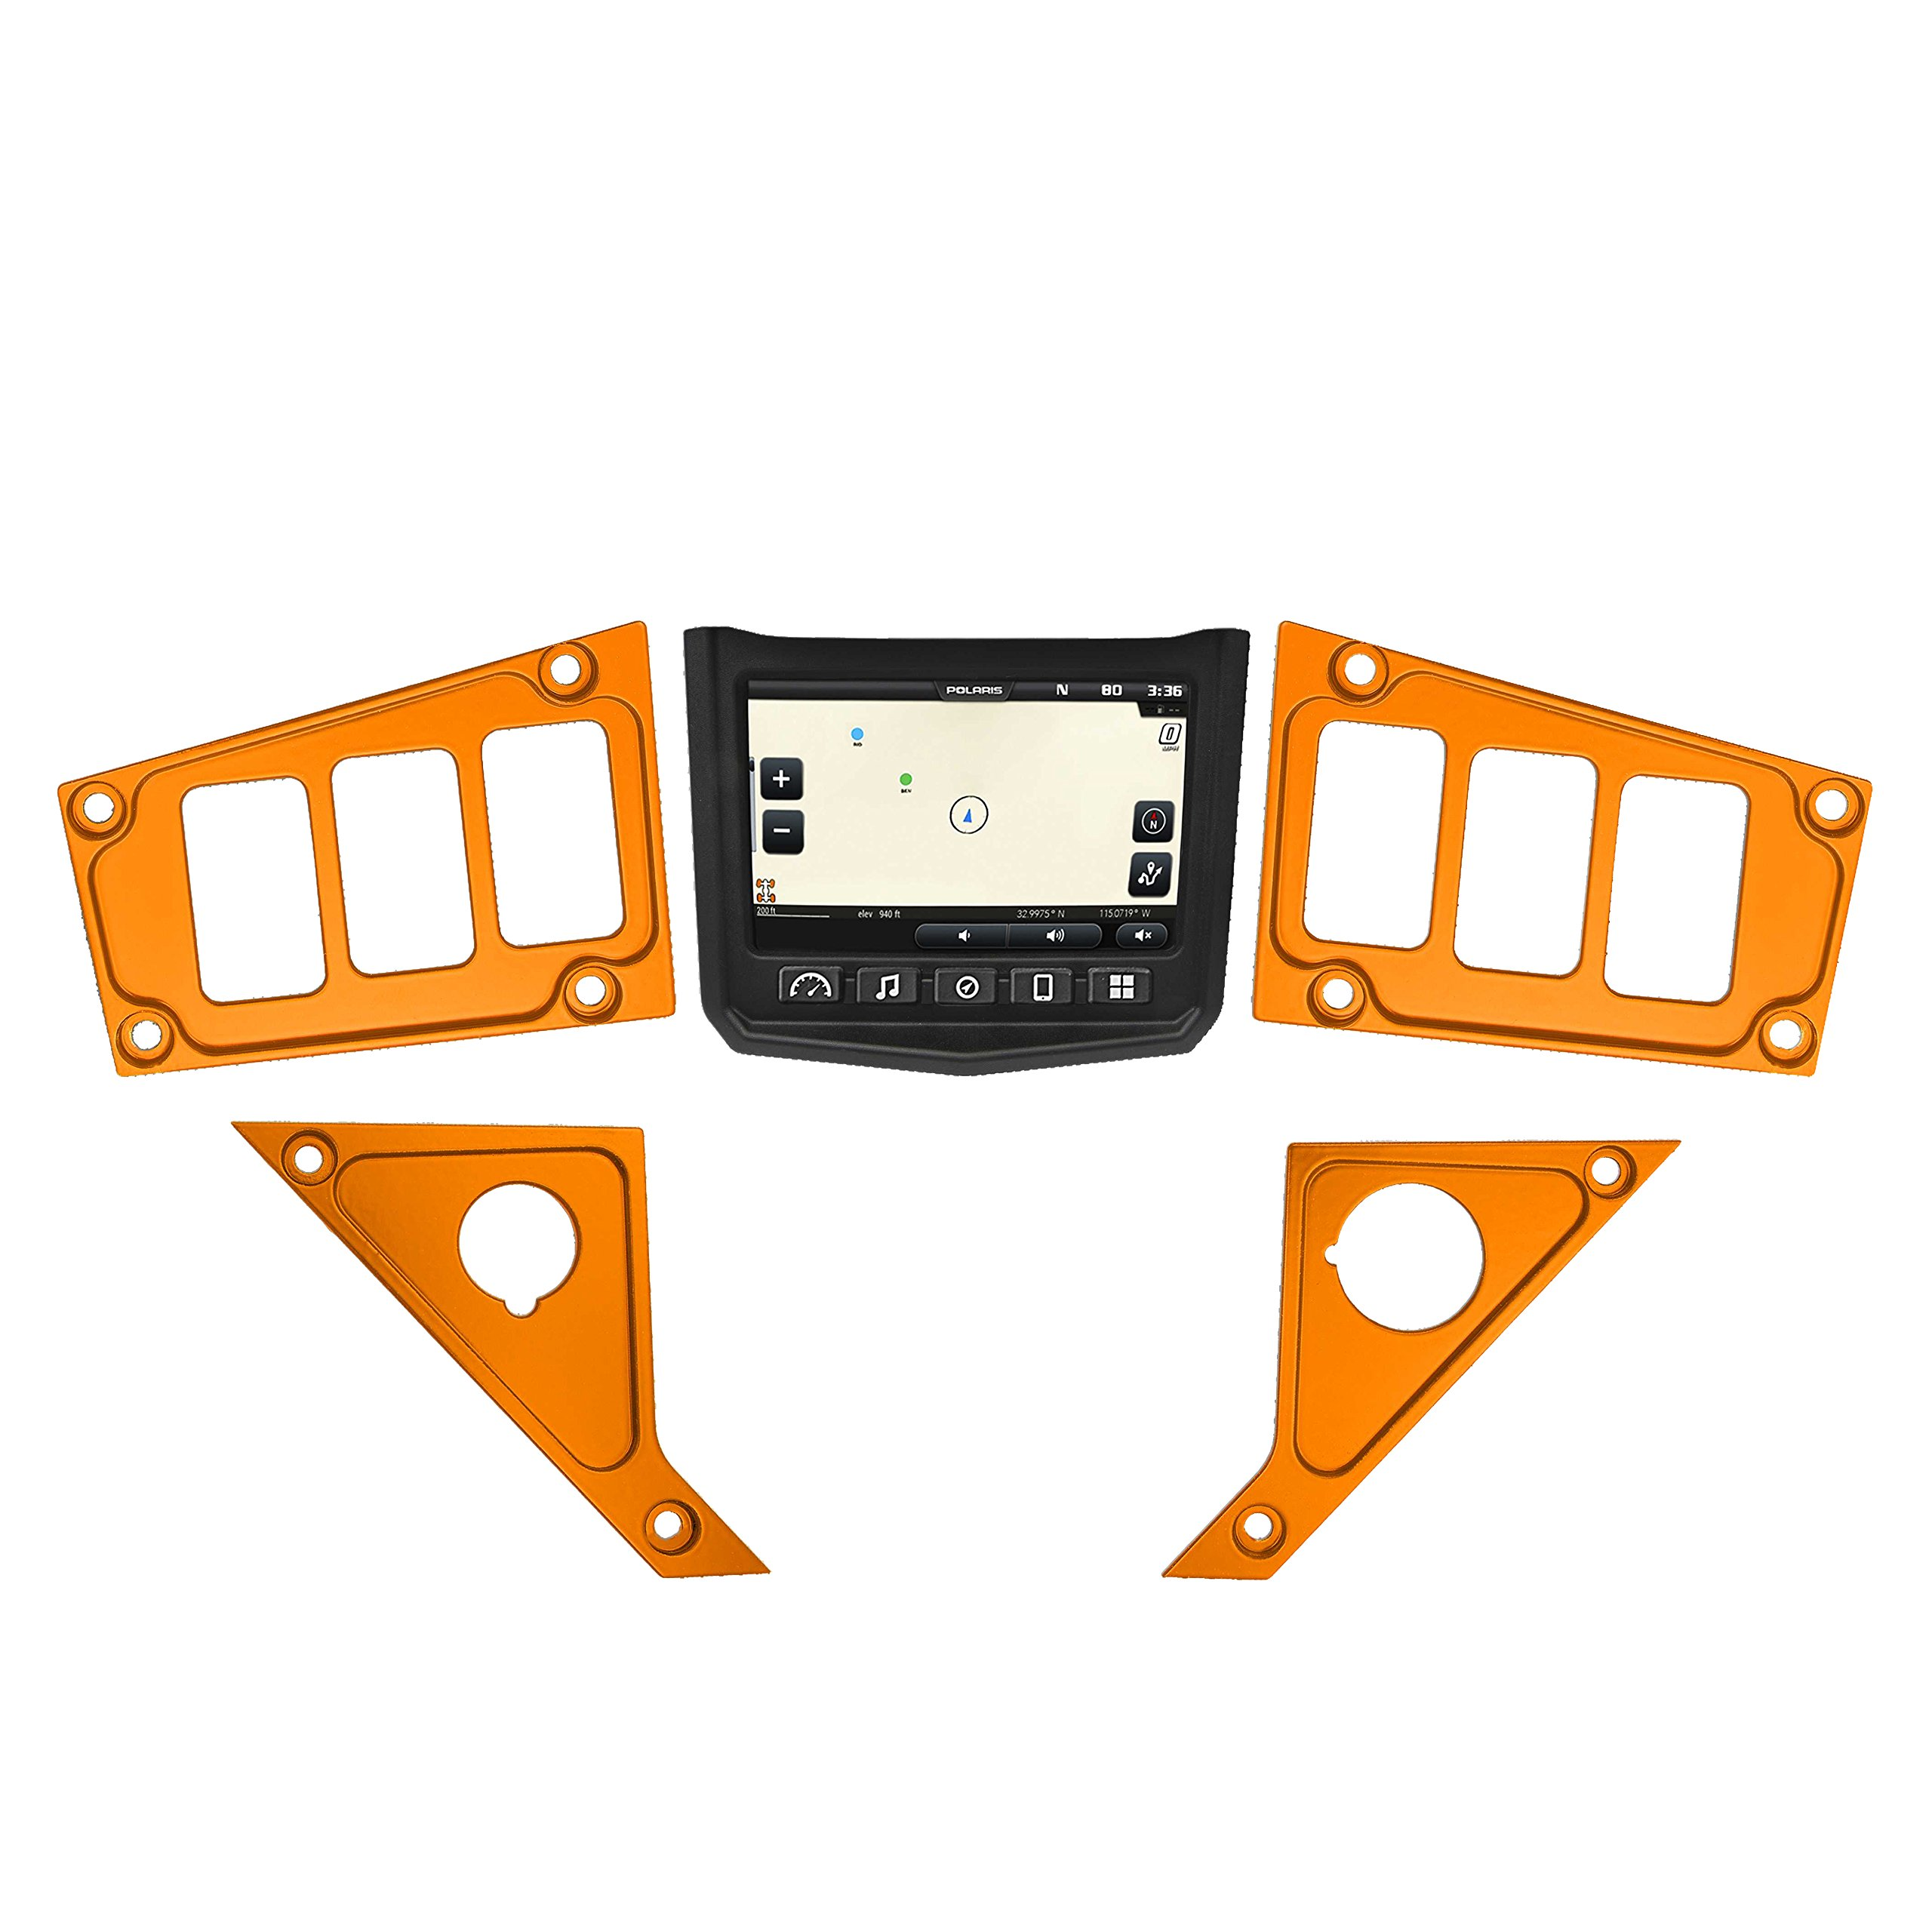 STV Motorsports 2017-2018 Polaris RZR XP 1000 RIDE COMMAND Custom Switch Dash Panel Plates - 100% MADE in USA (short kit, orange)